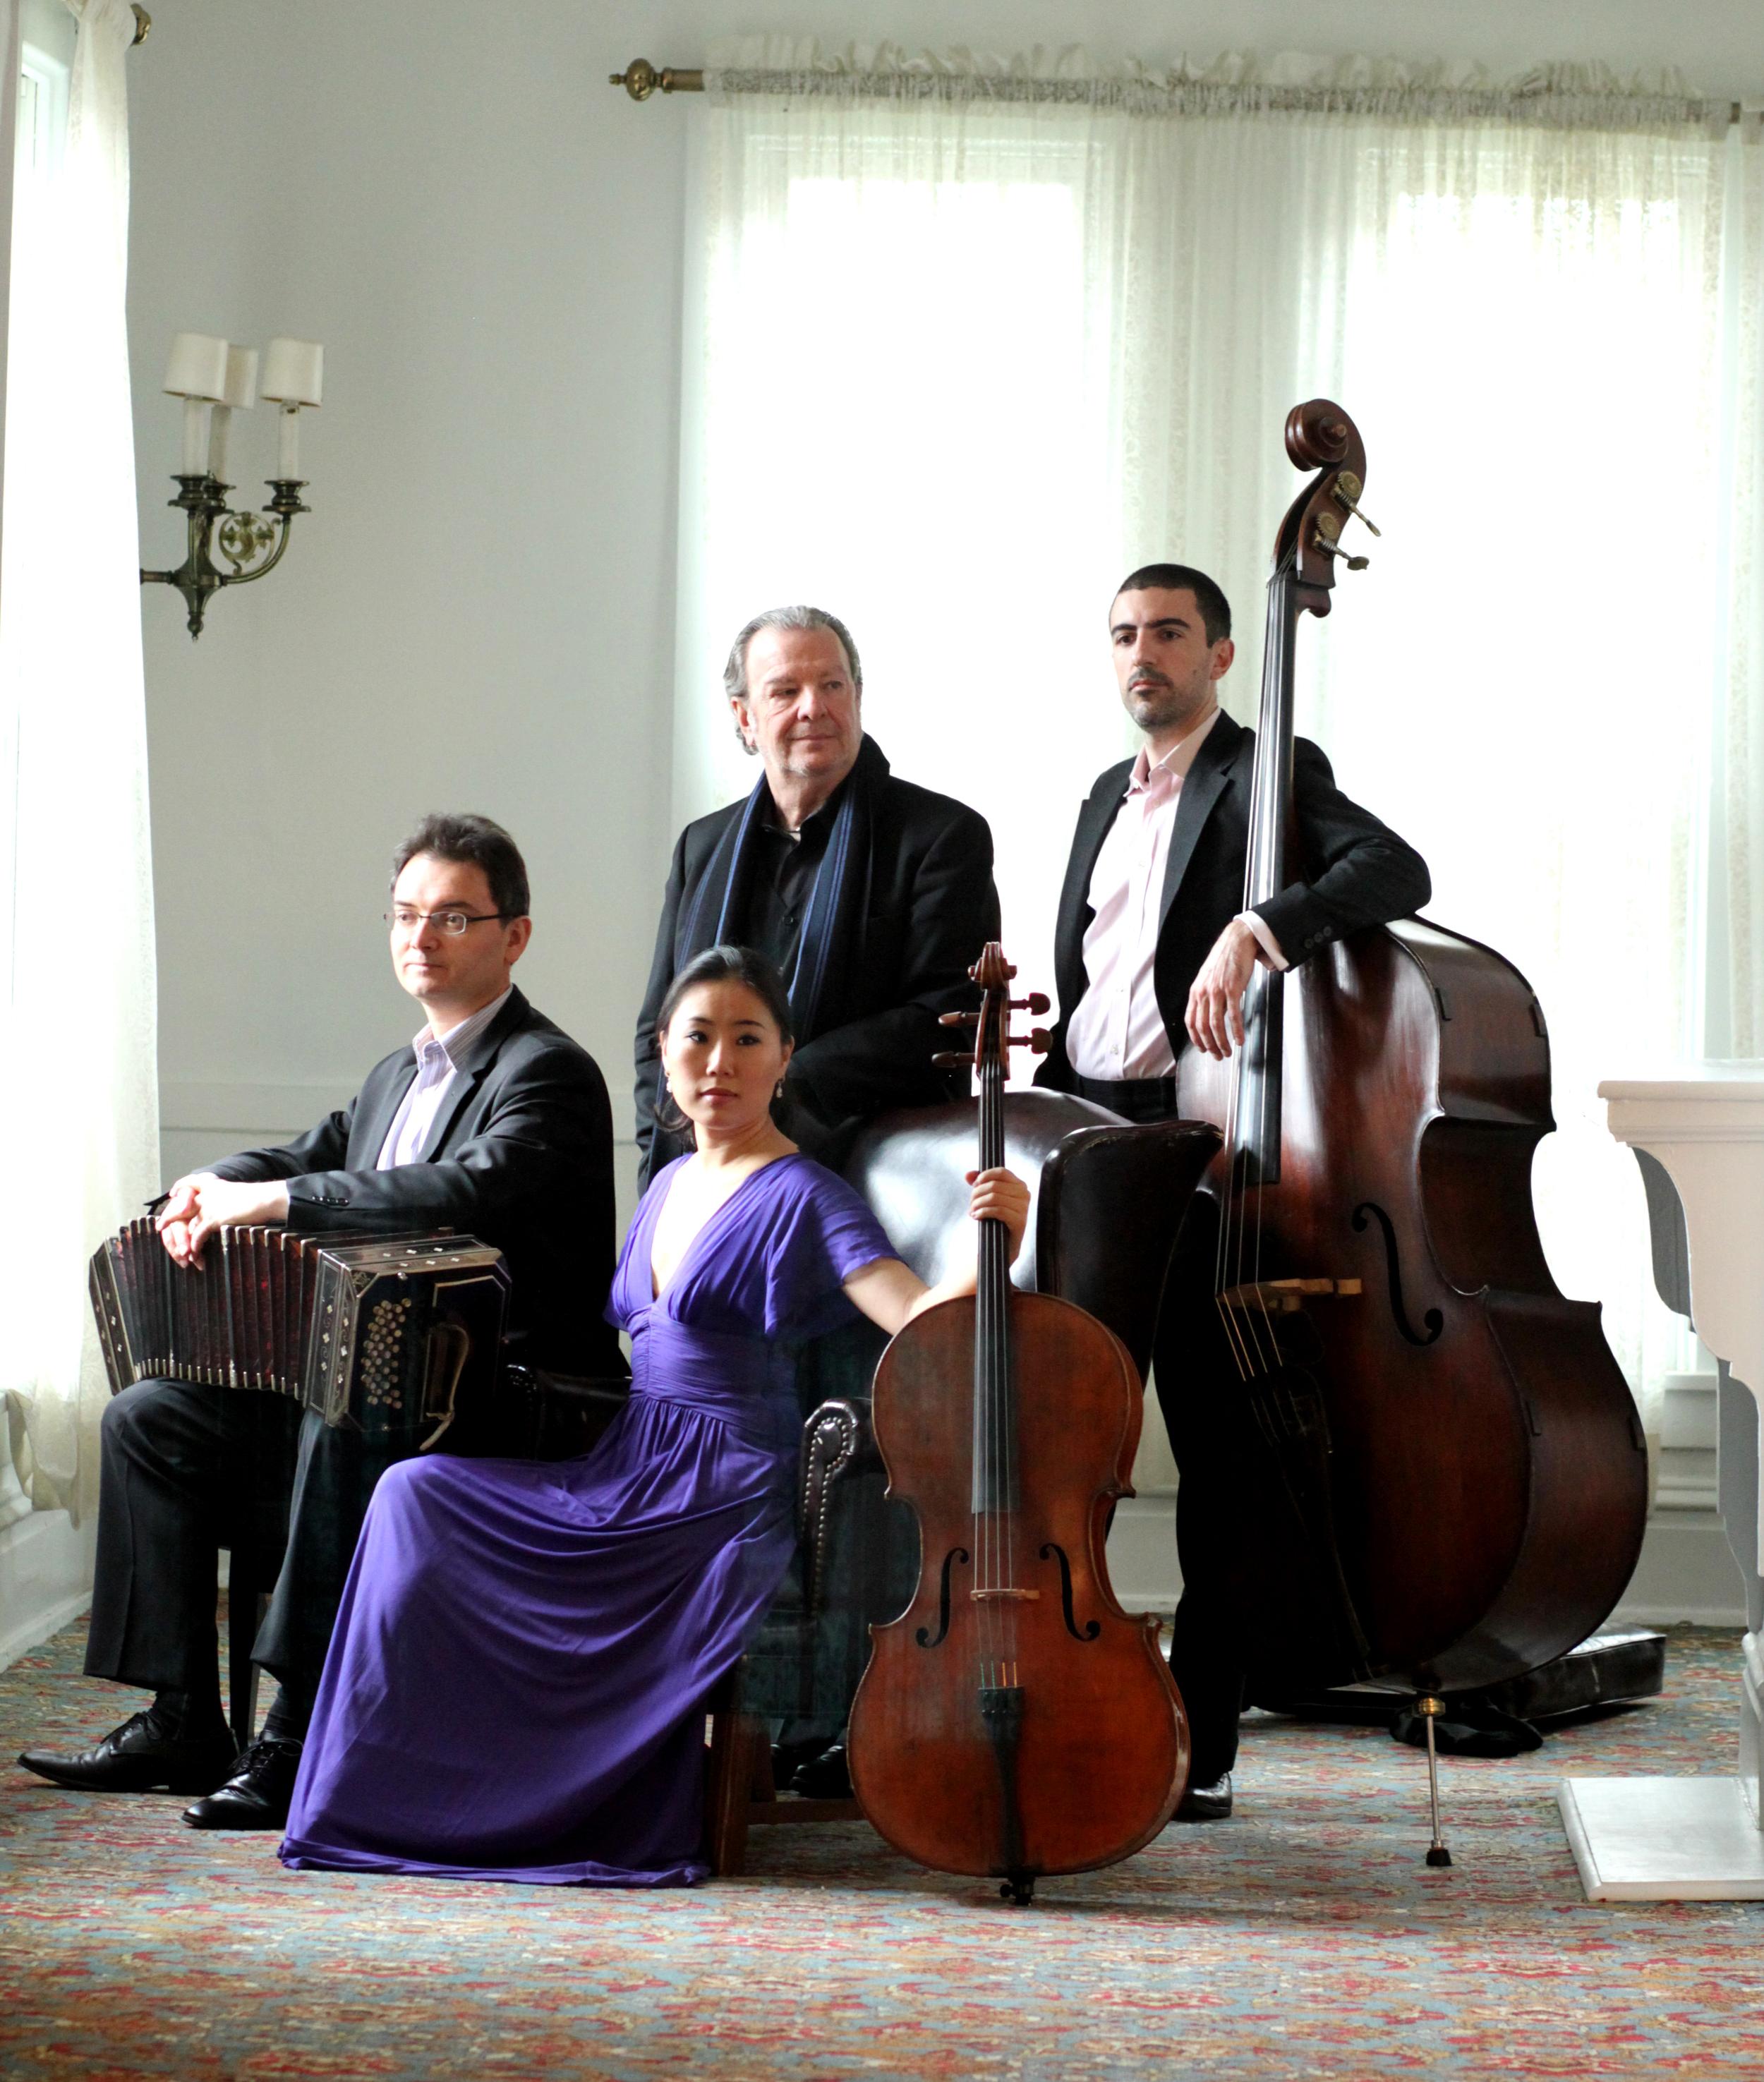 Ziegler Elegant Quartet by Masae Shiwa-RM edit.jpg